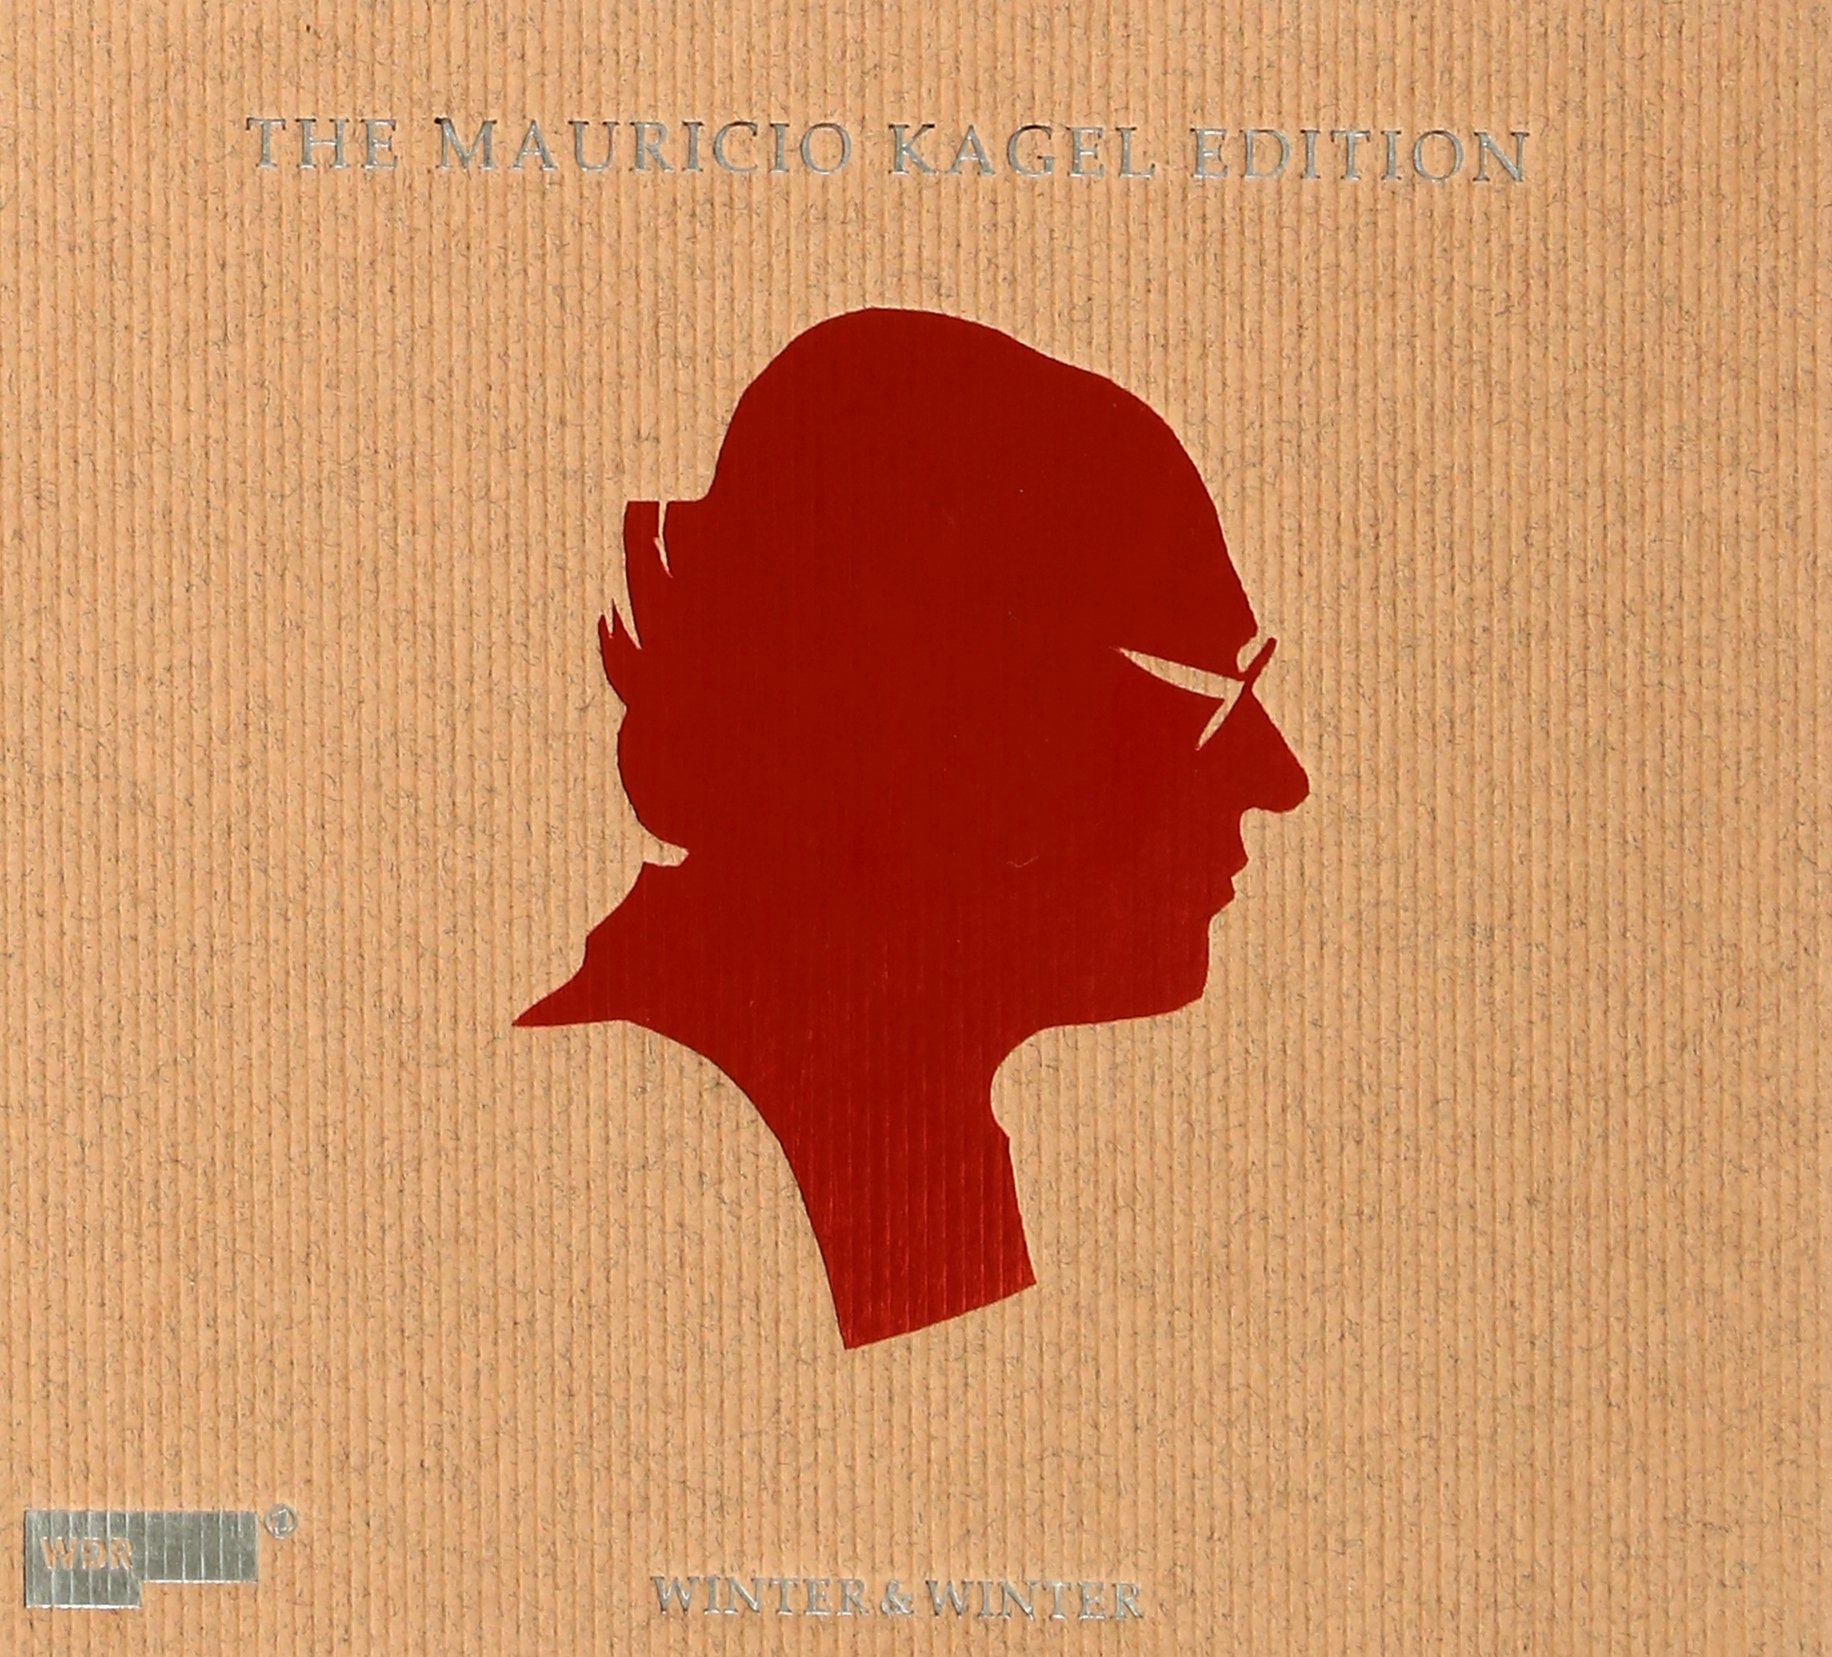 Mauricio Kagel Edition